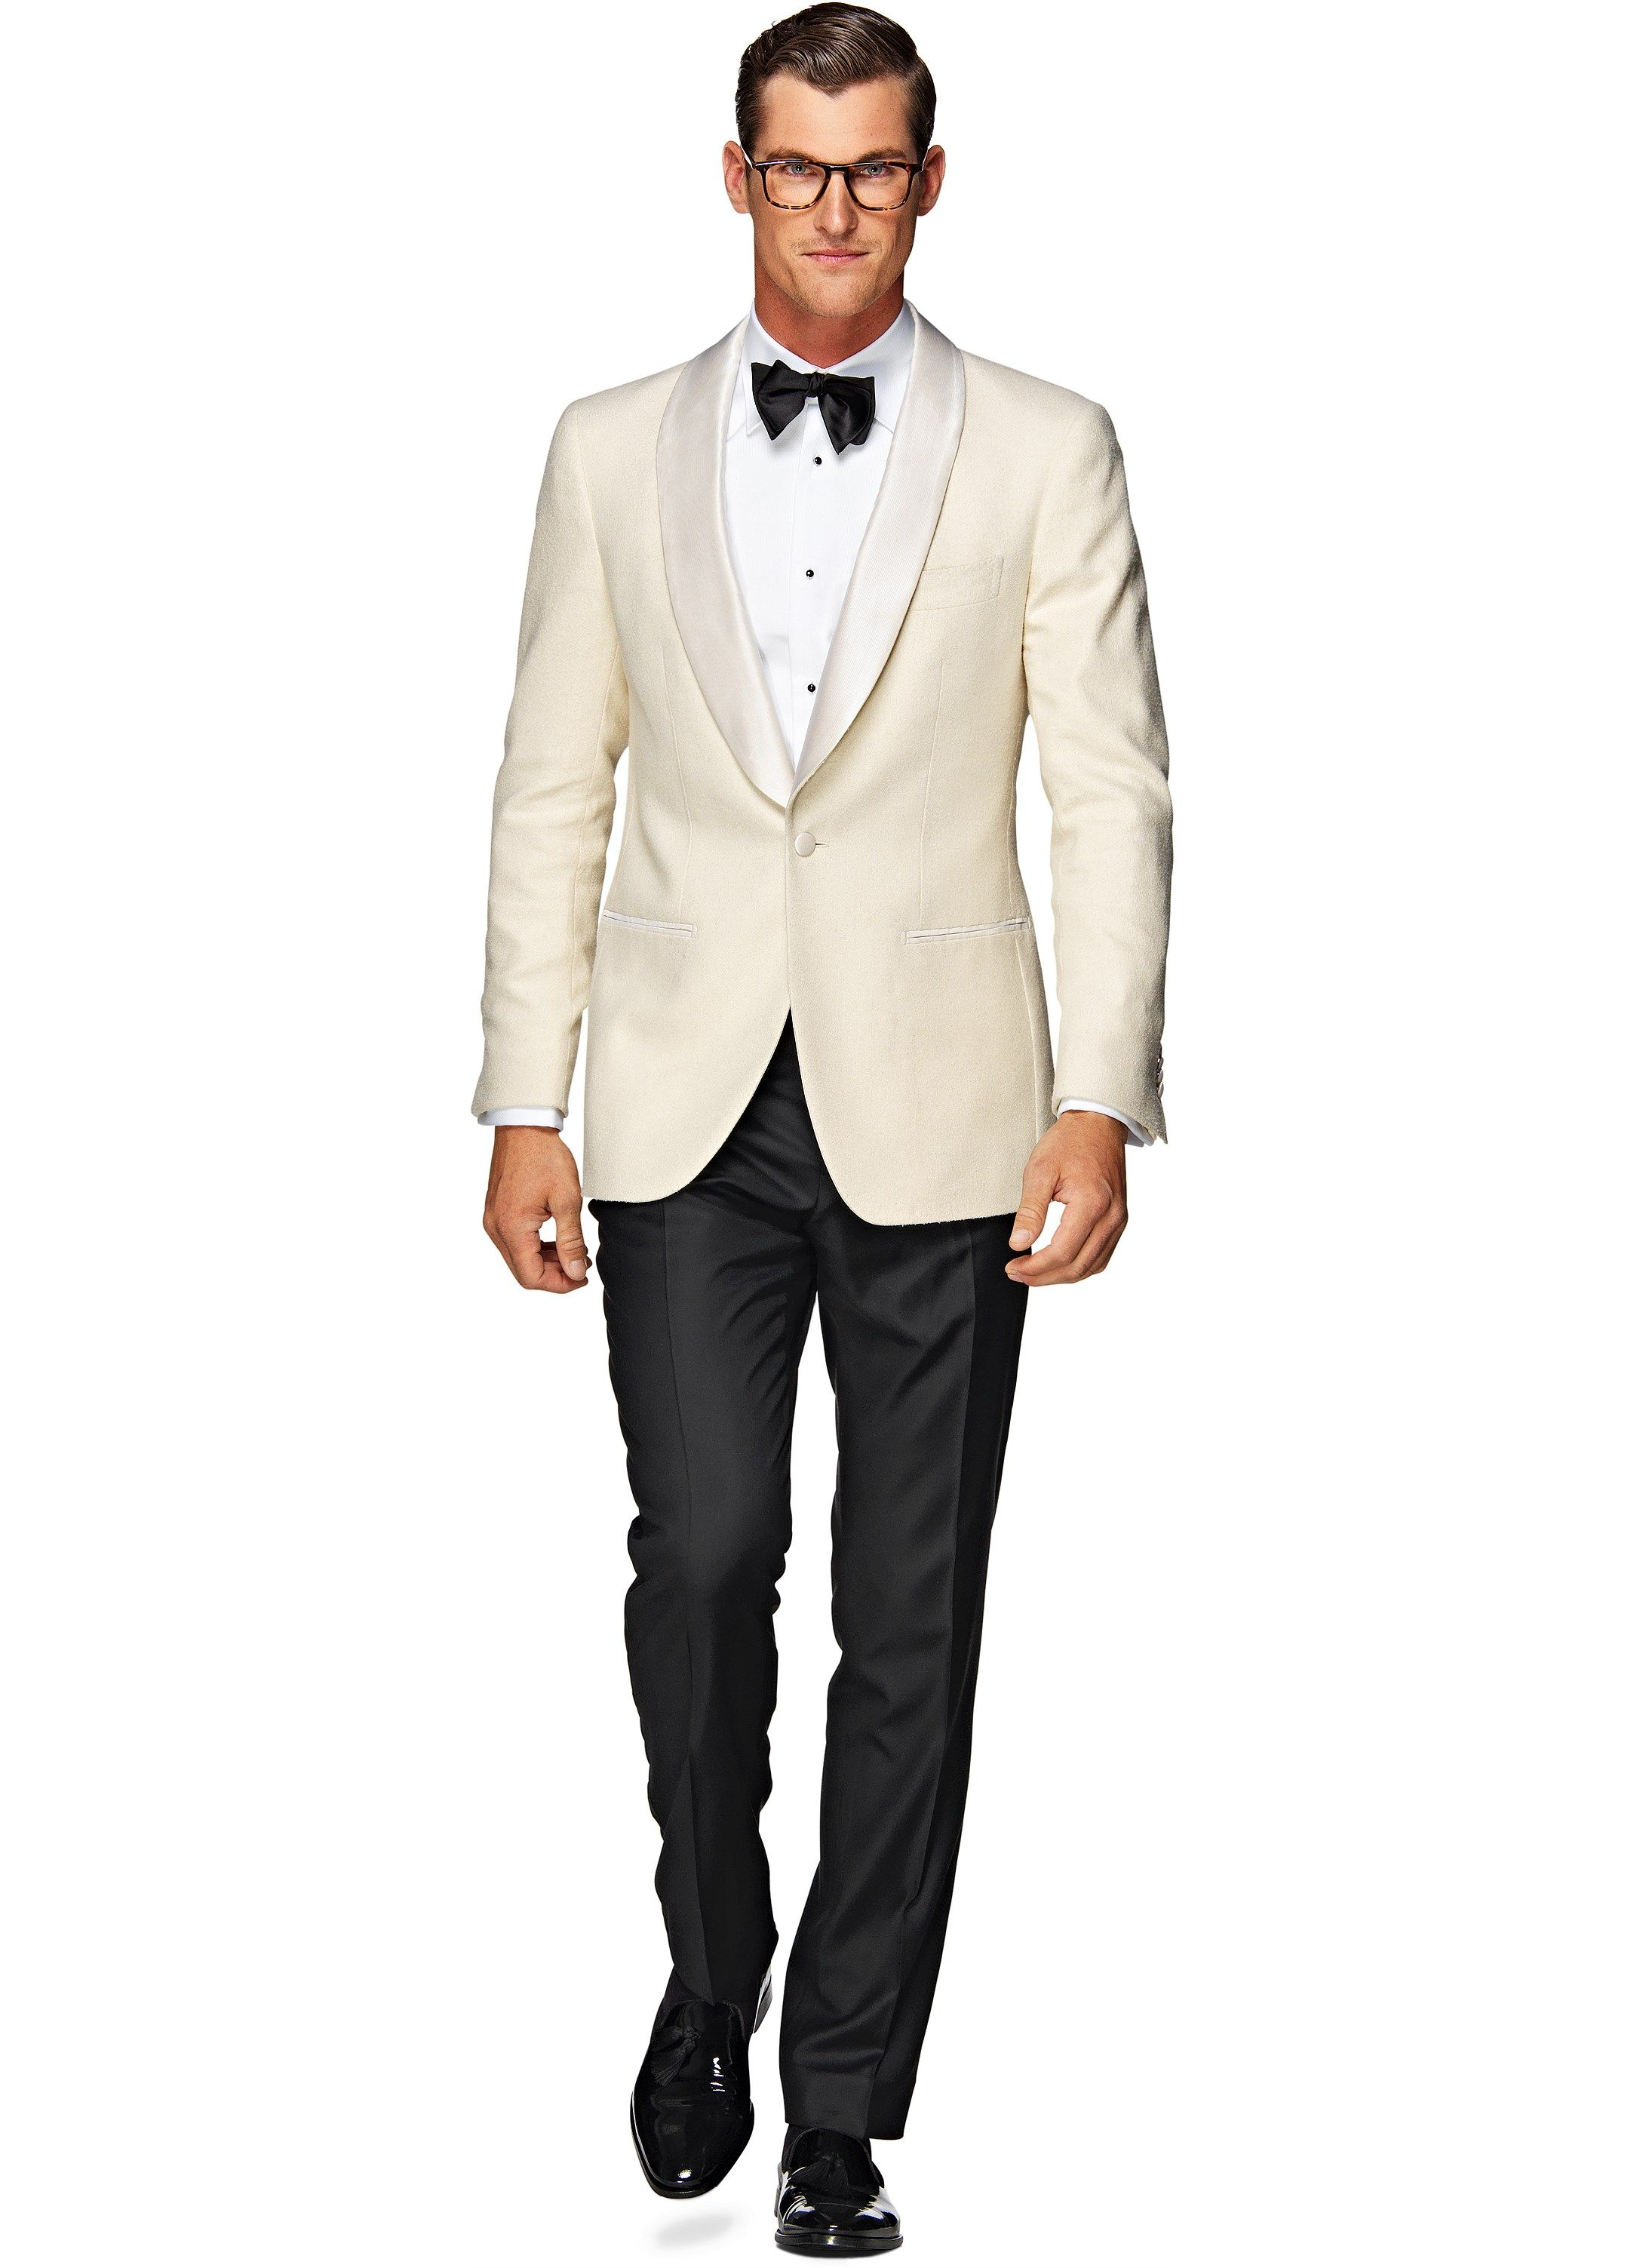 Jacket Off White Plain Manhattan C804i Suitsupply Online